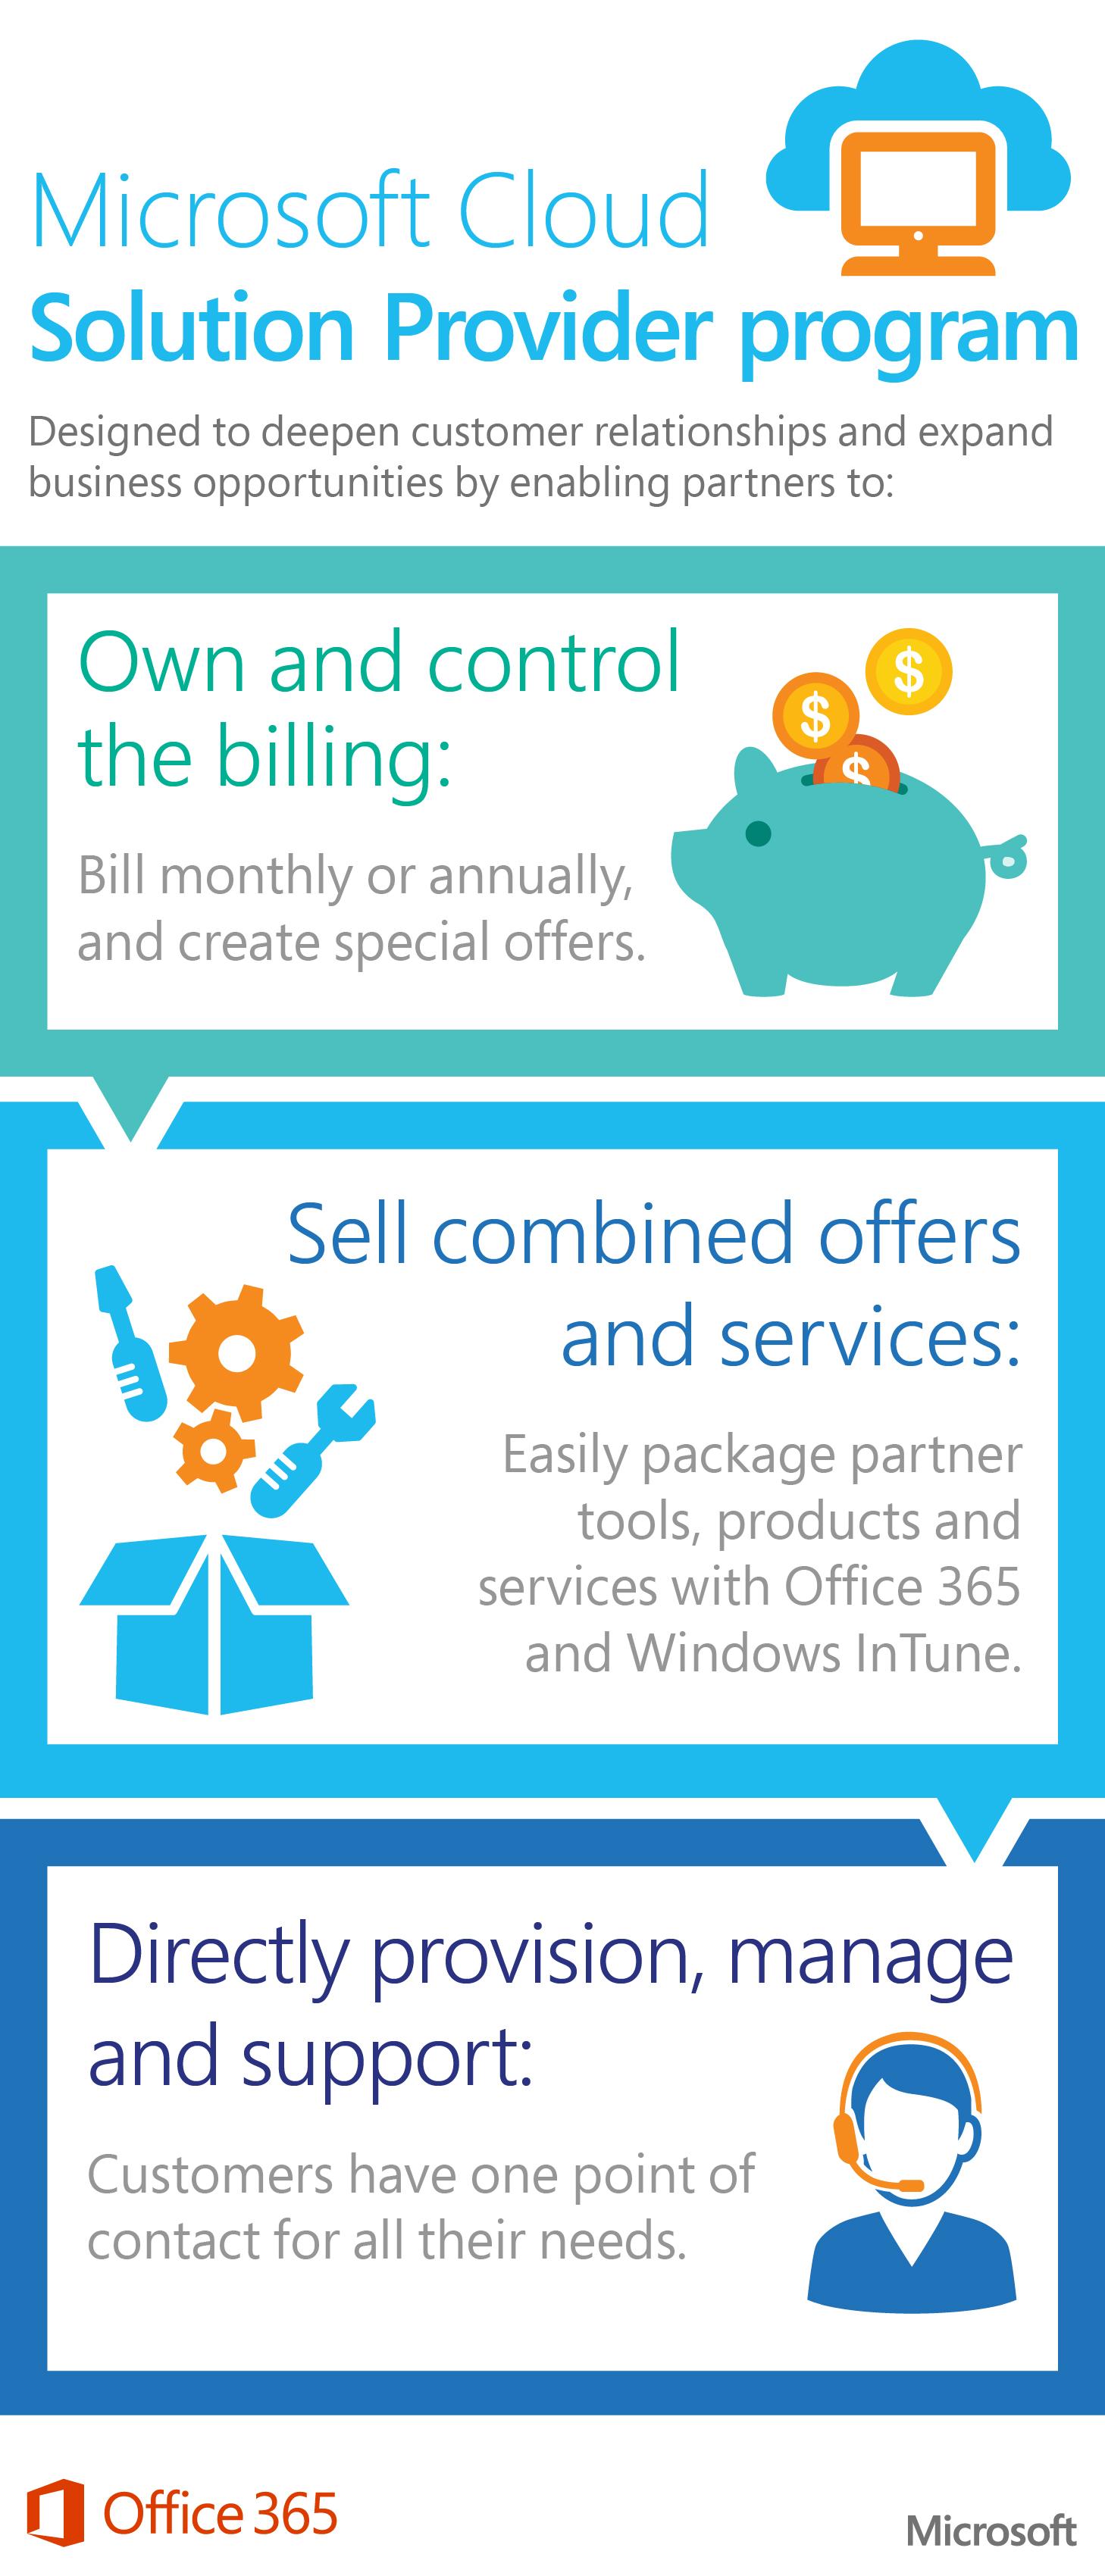 wpc office artemis infographic_v4_071014 01